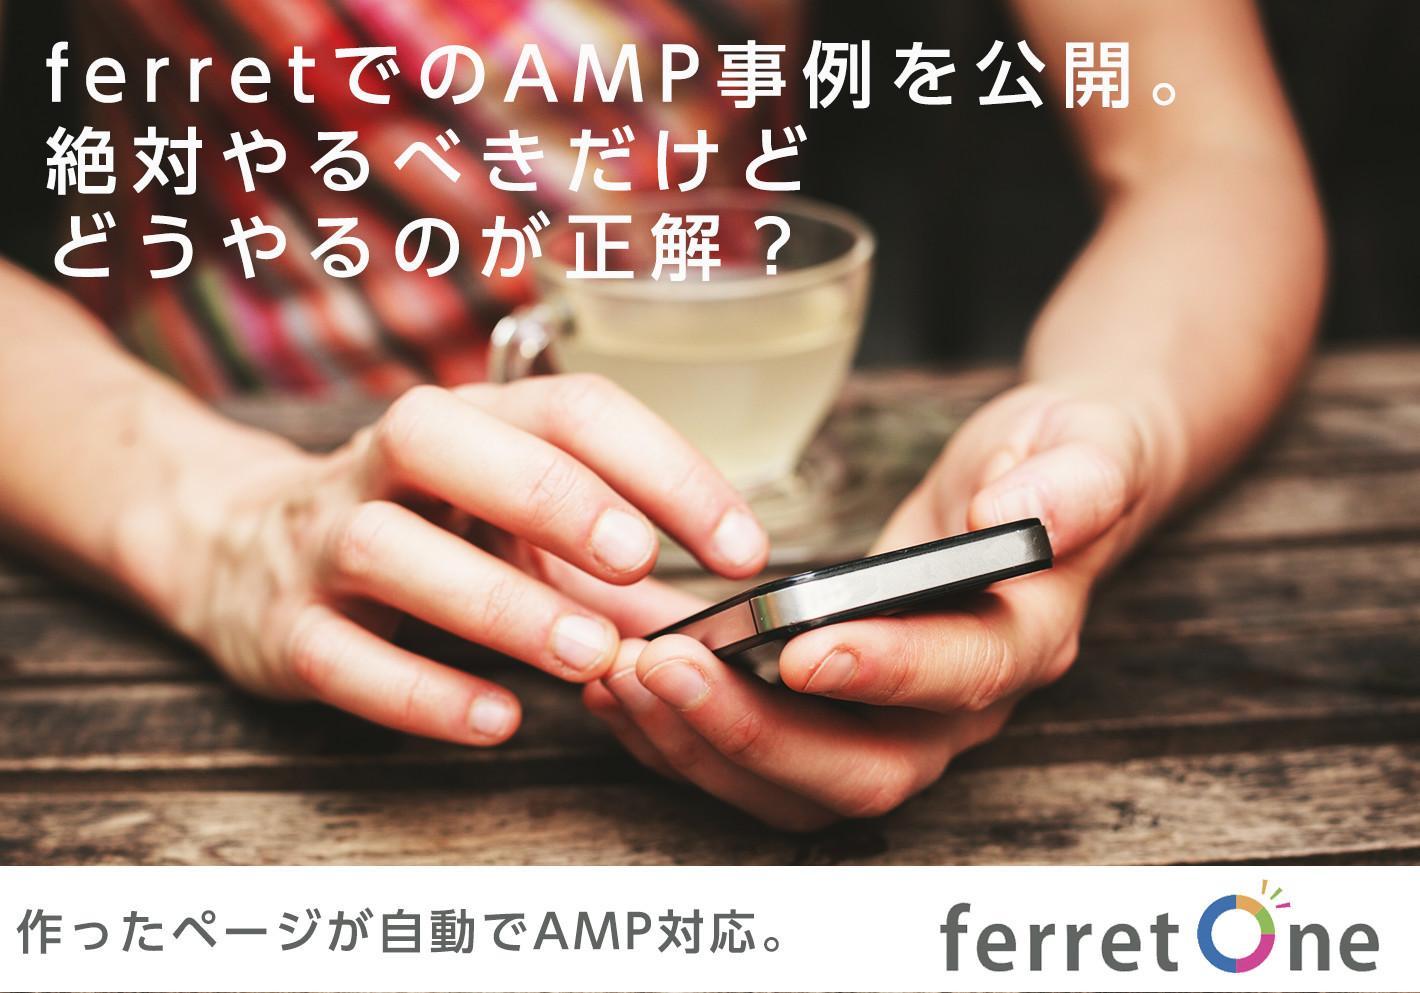 AMPセッションが3ヶ月間で700%アップ